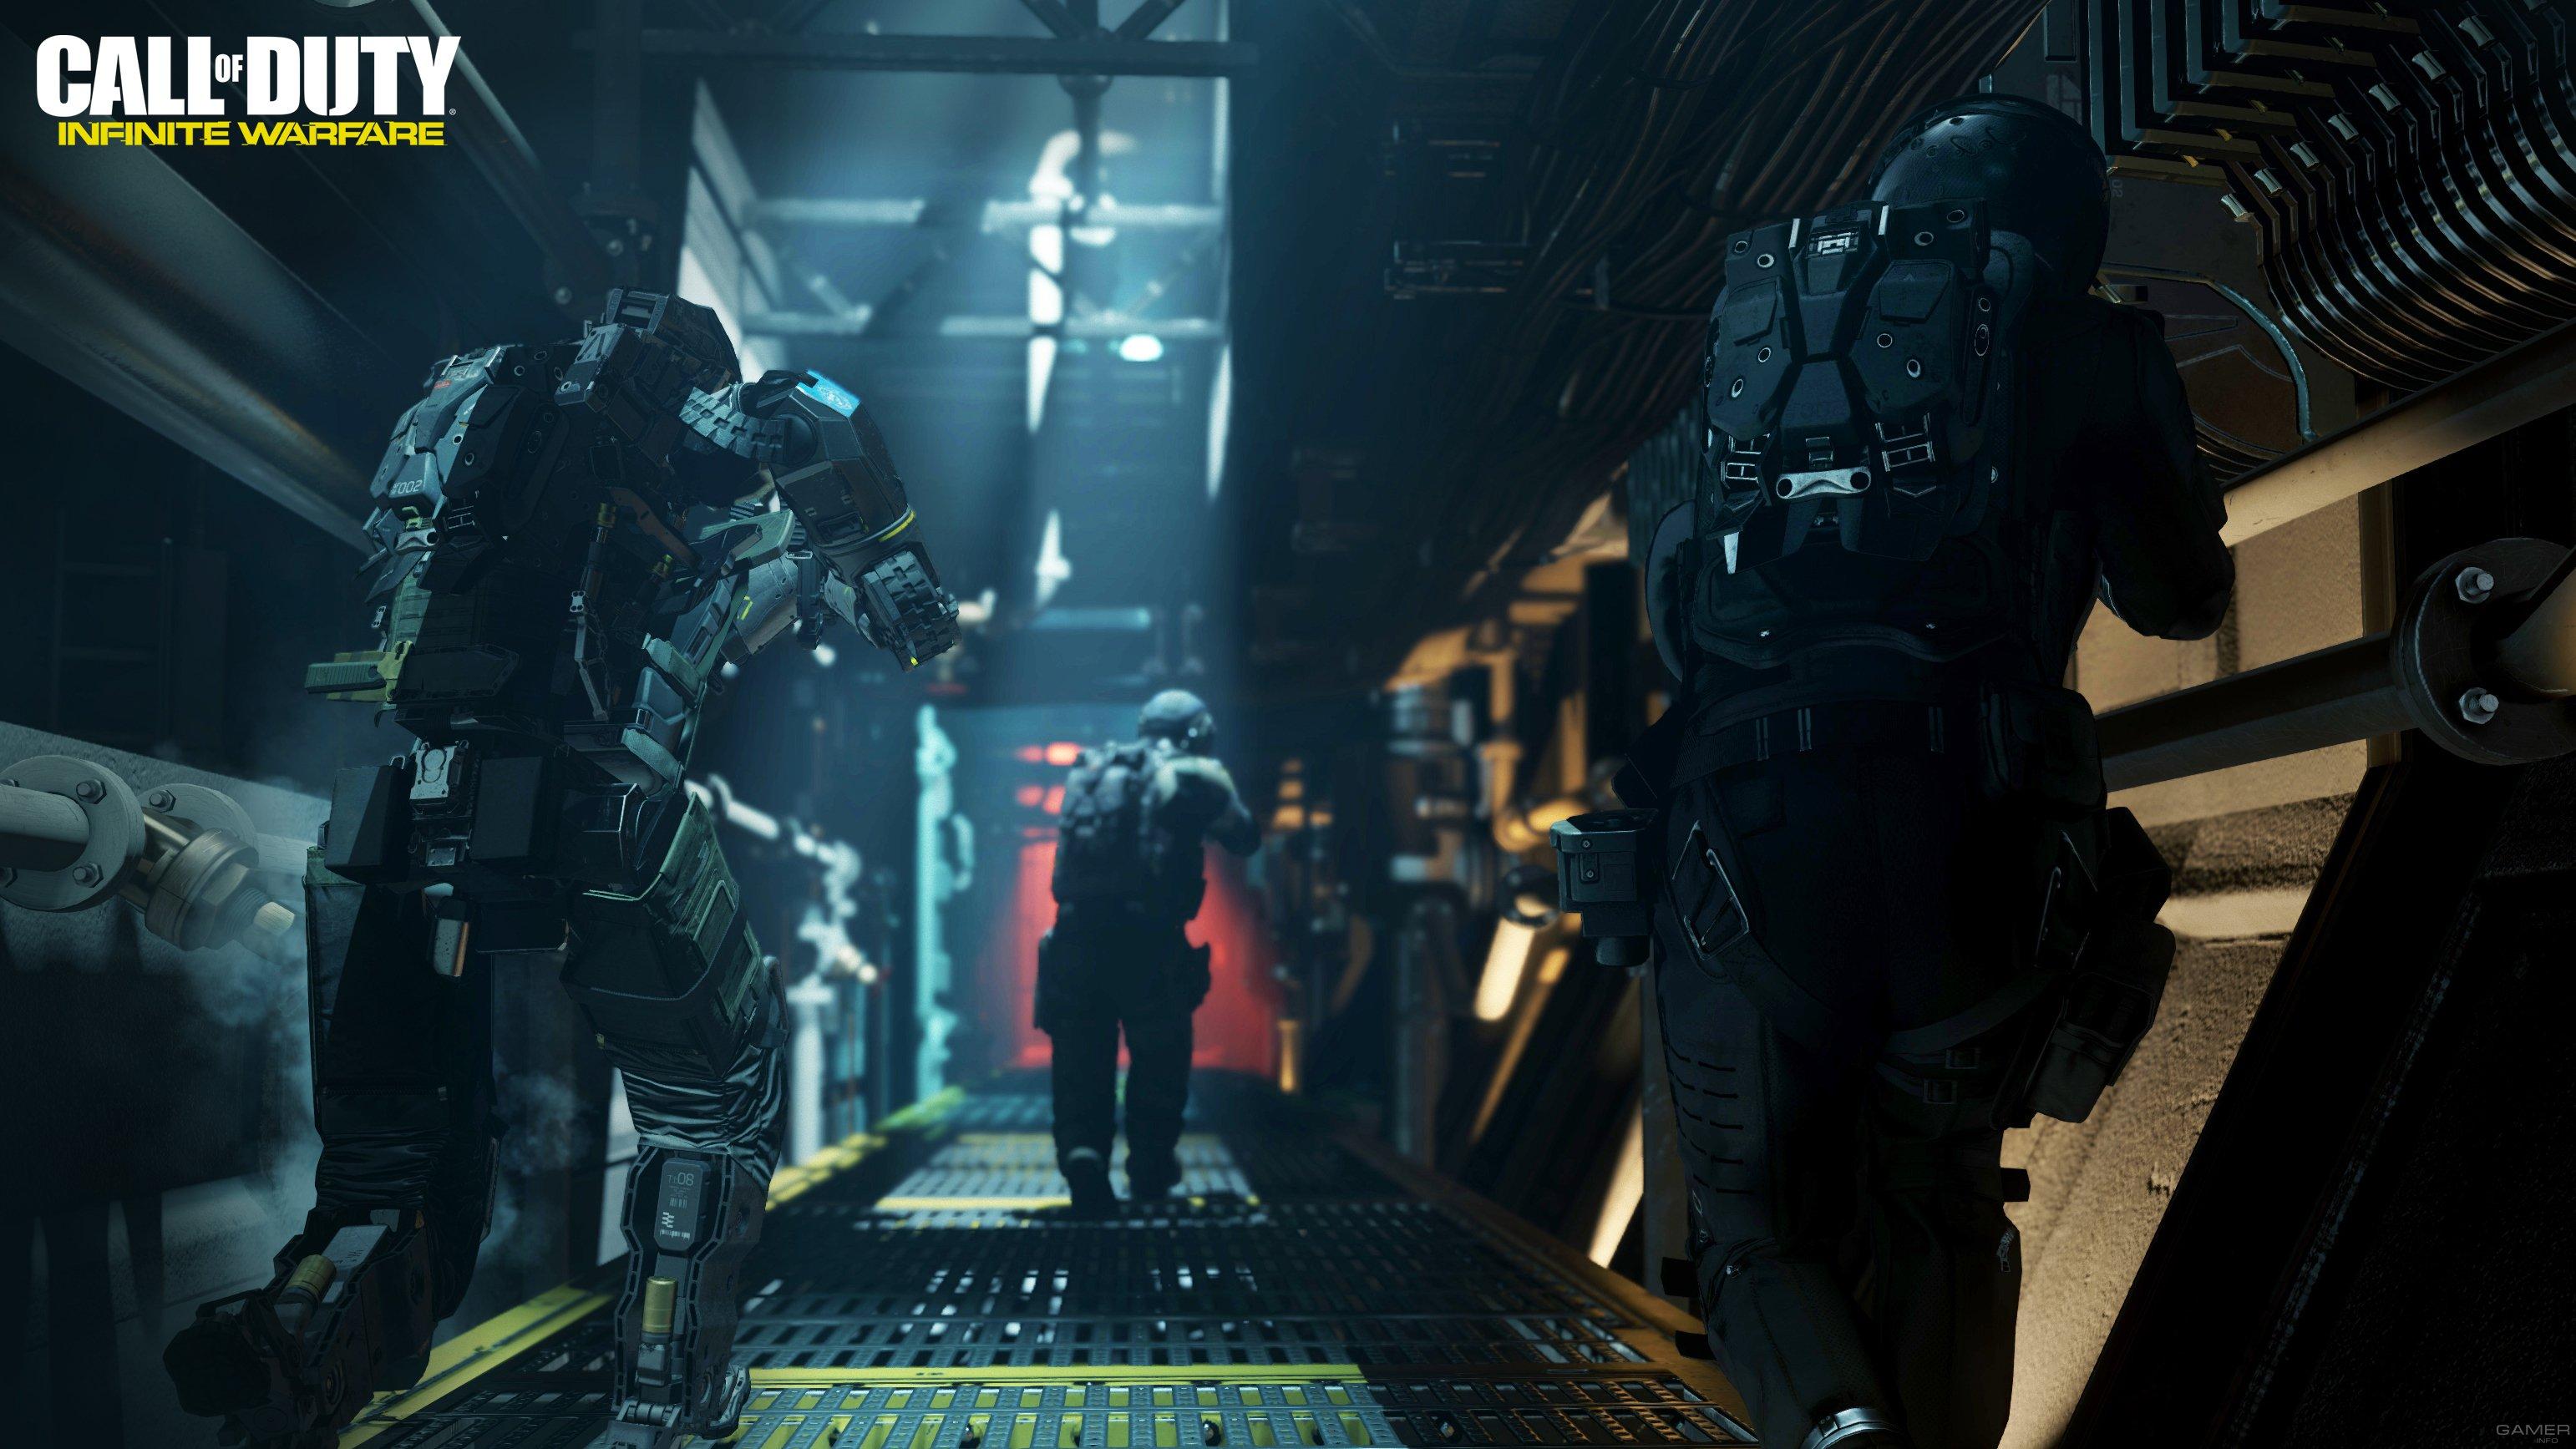 Хардкорный режим в Call of Duty: Infinite Warfare